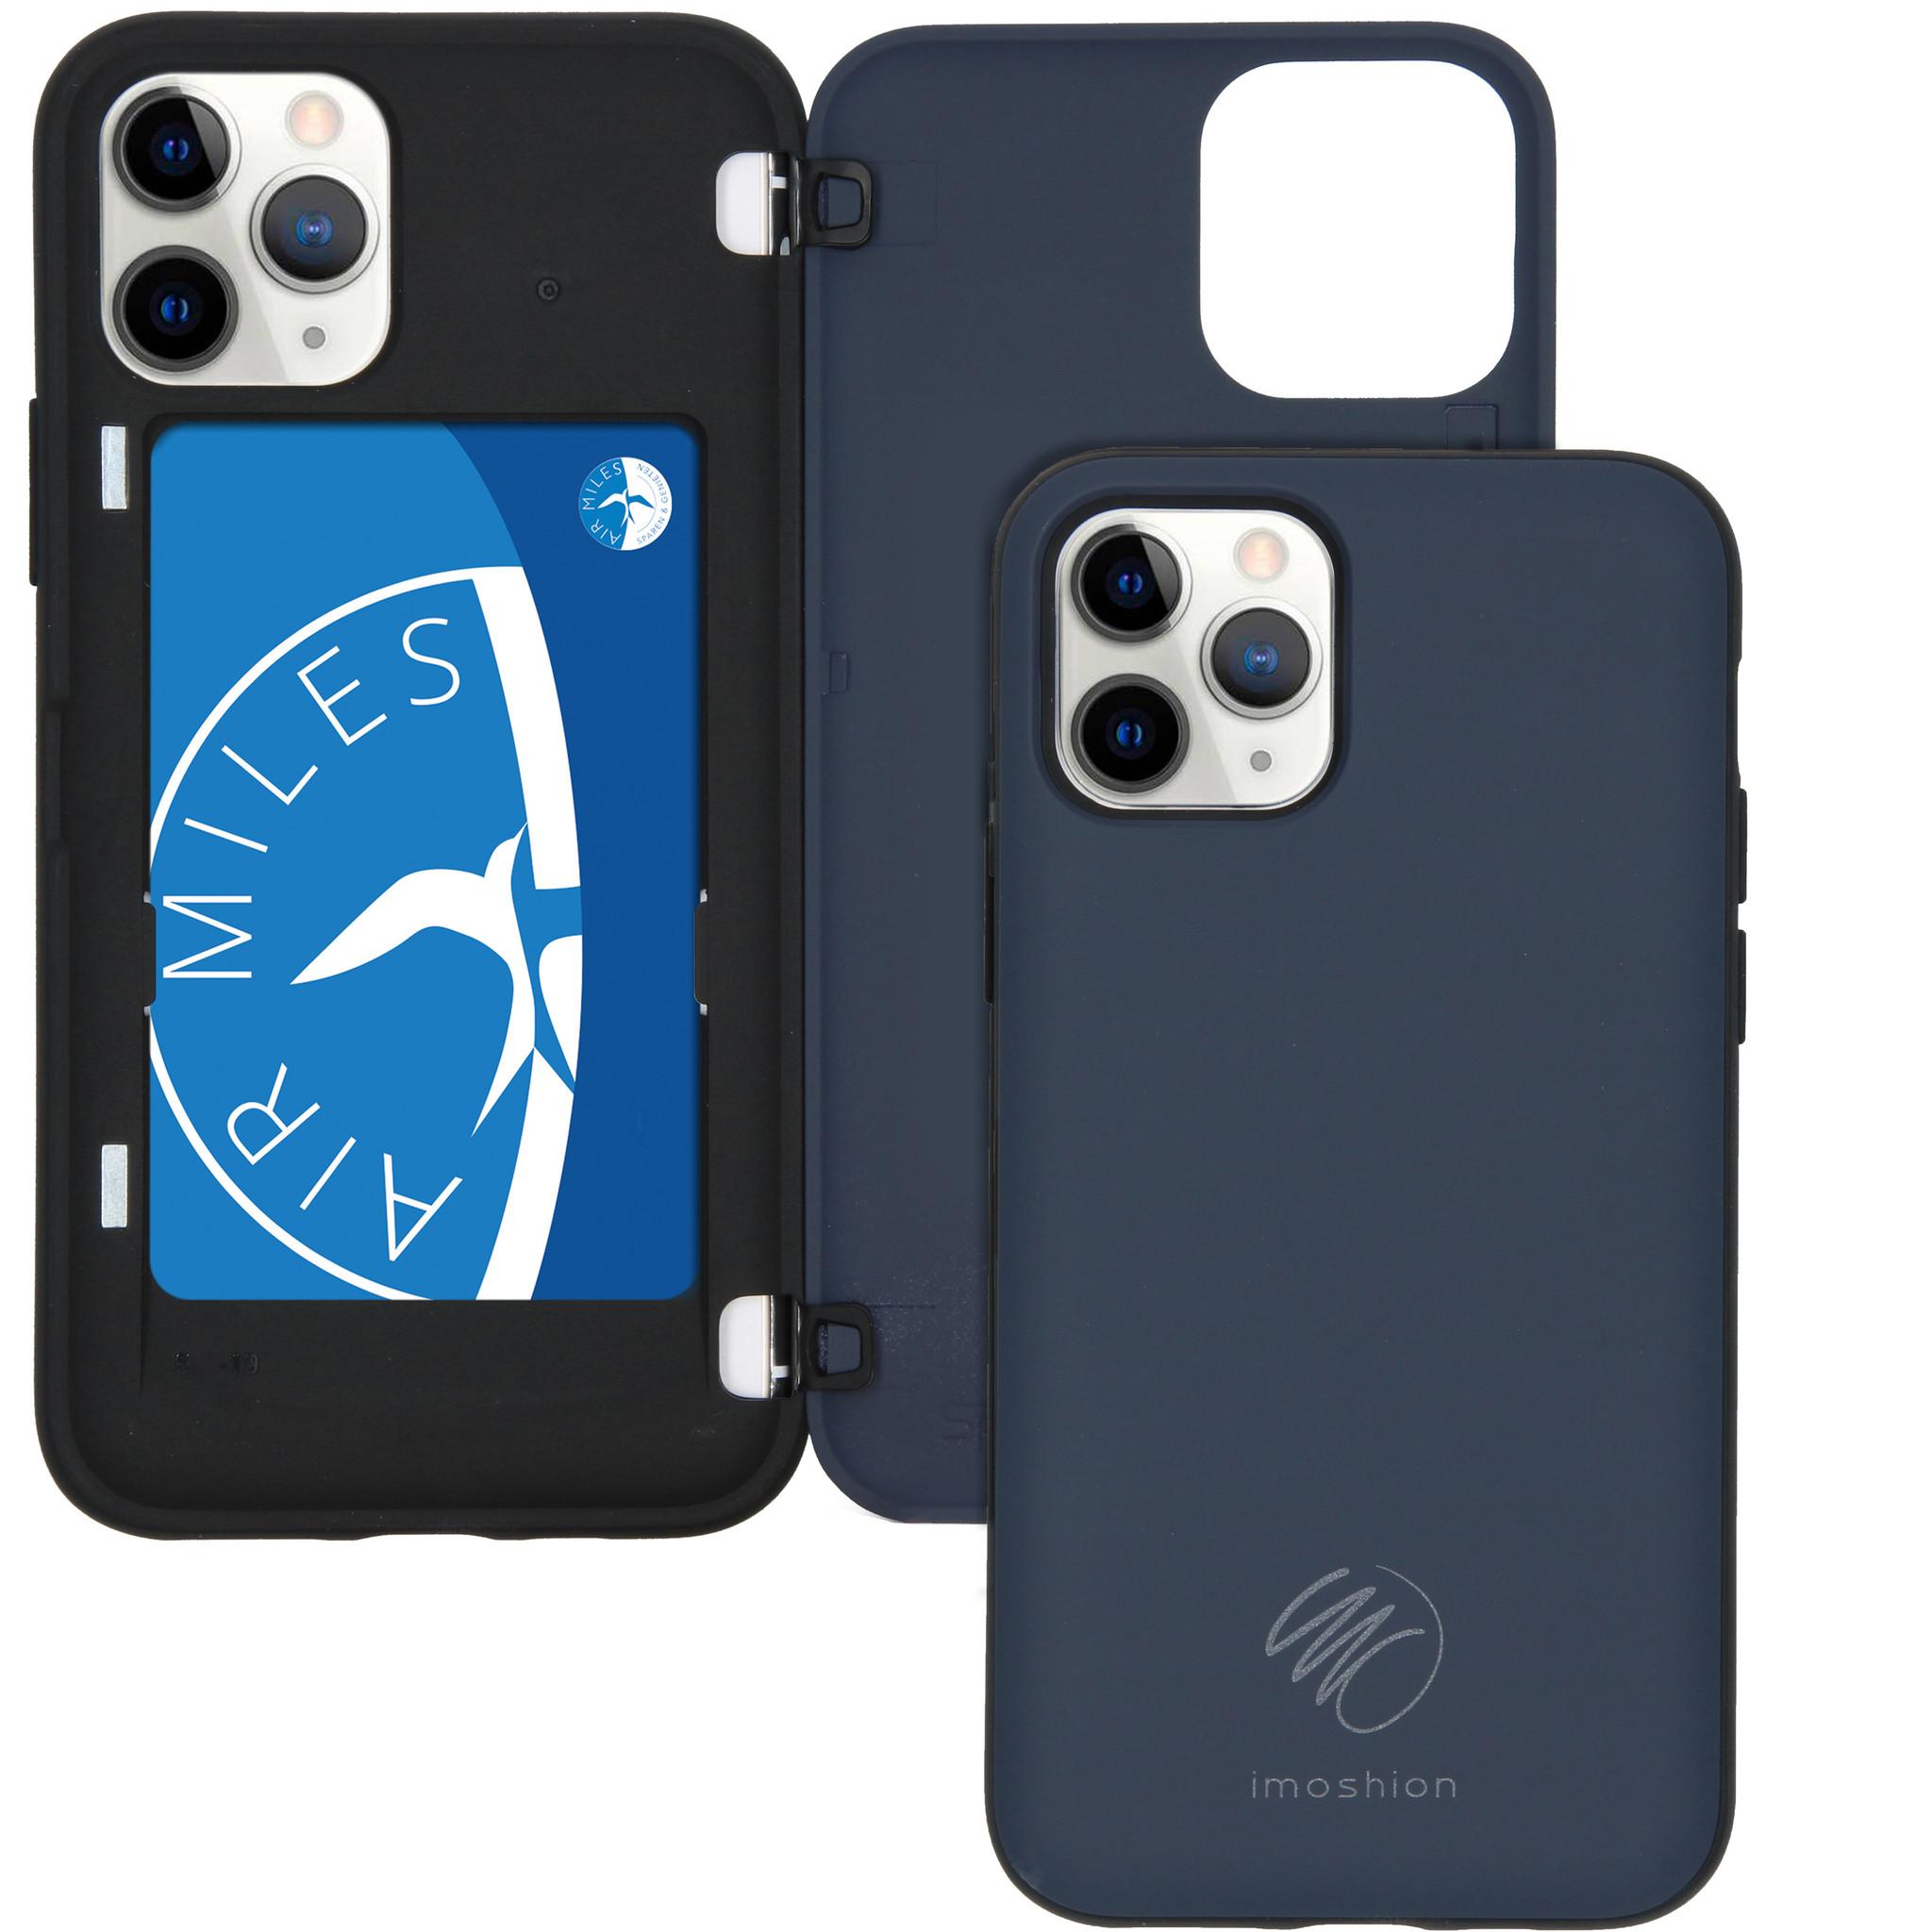 iMoshion Backcover met pashouder iPhone 11 Pro - Donkerblauw